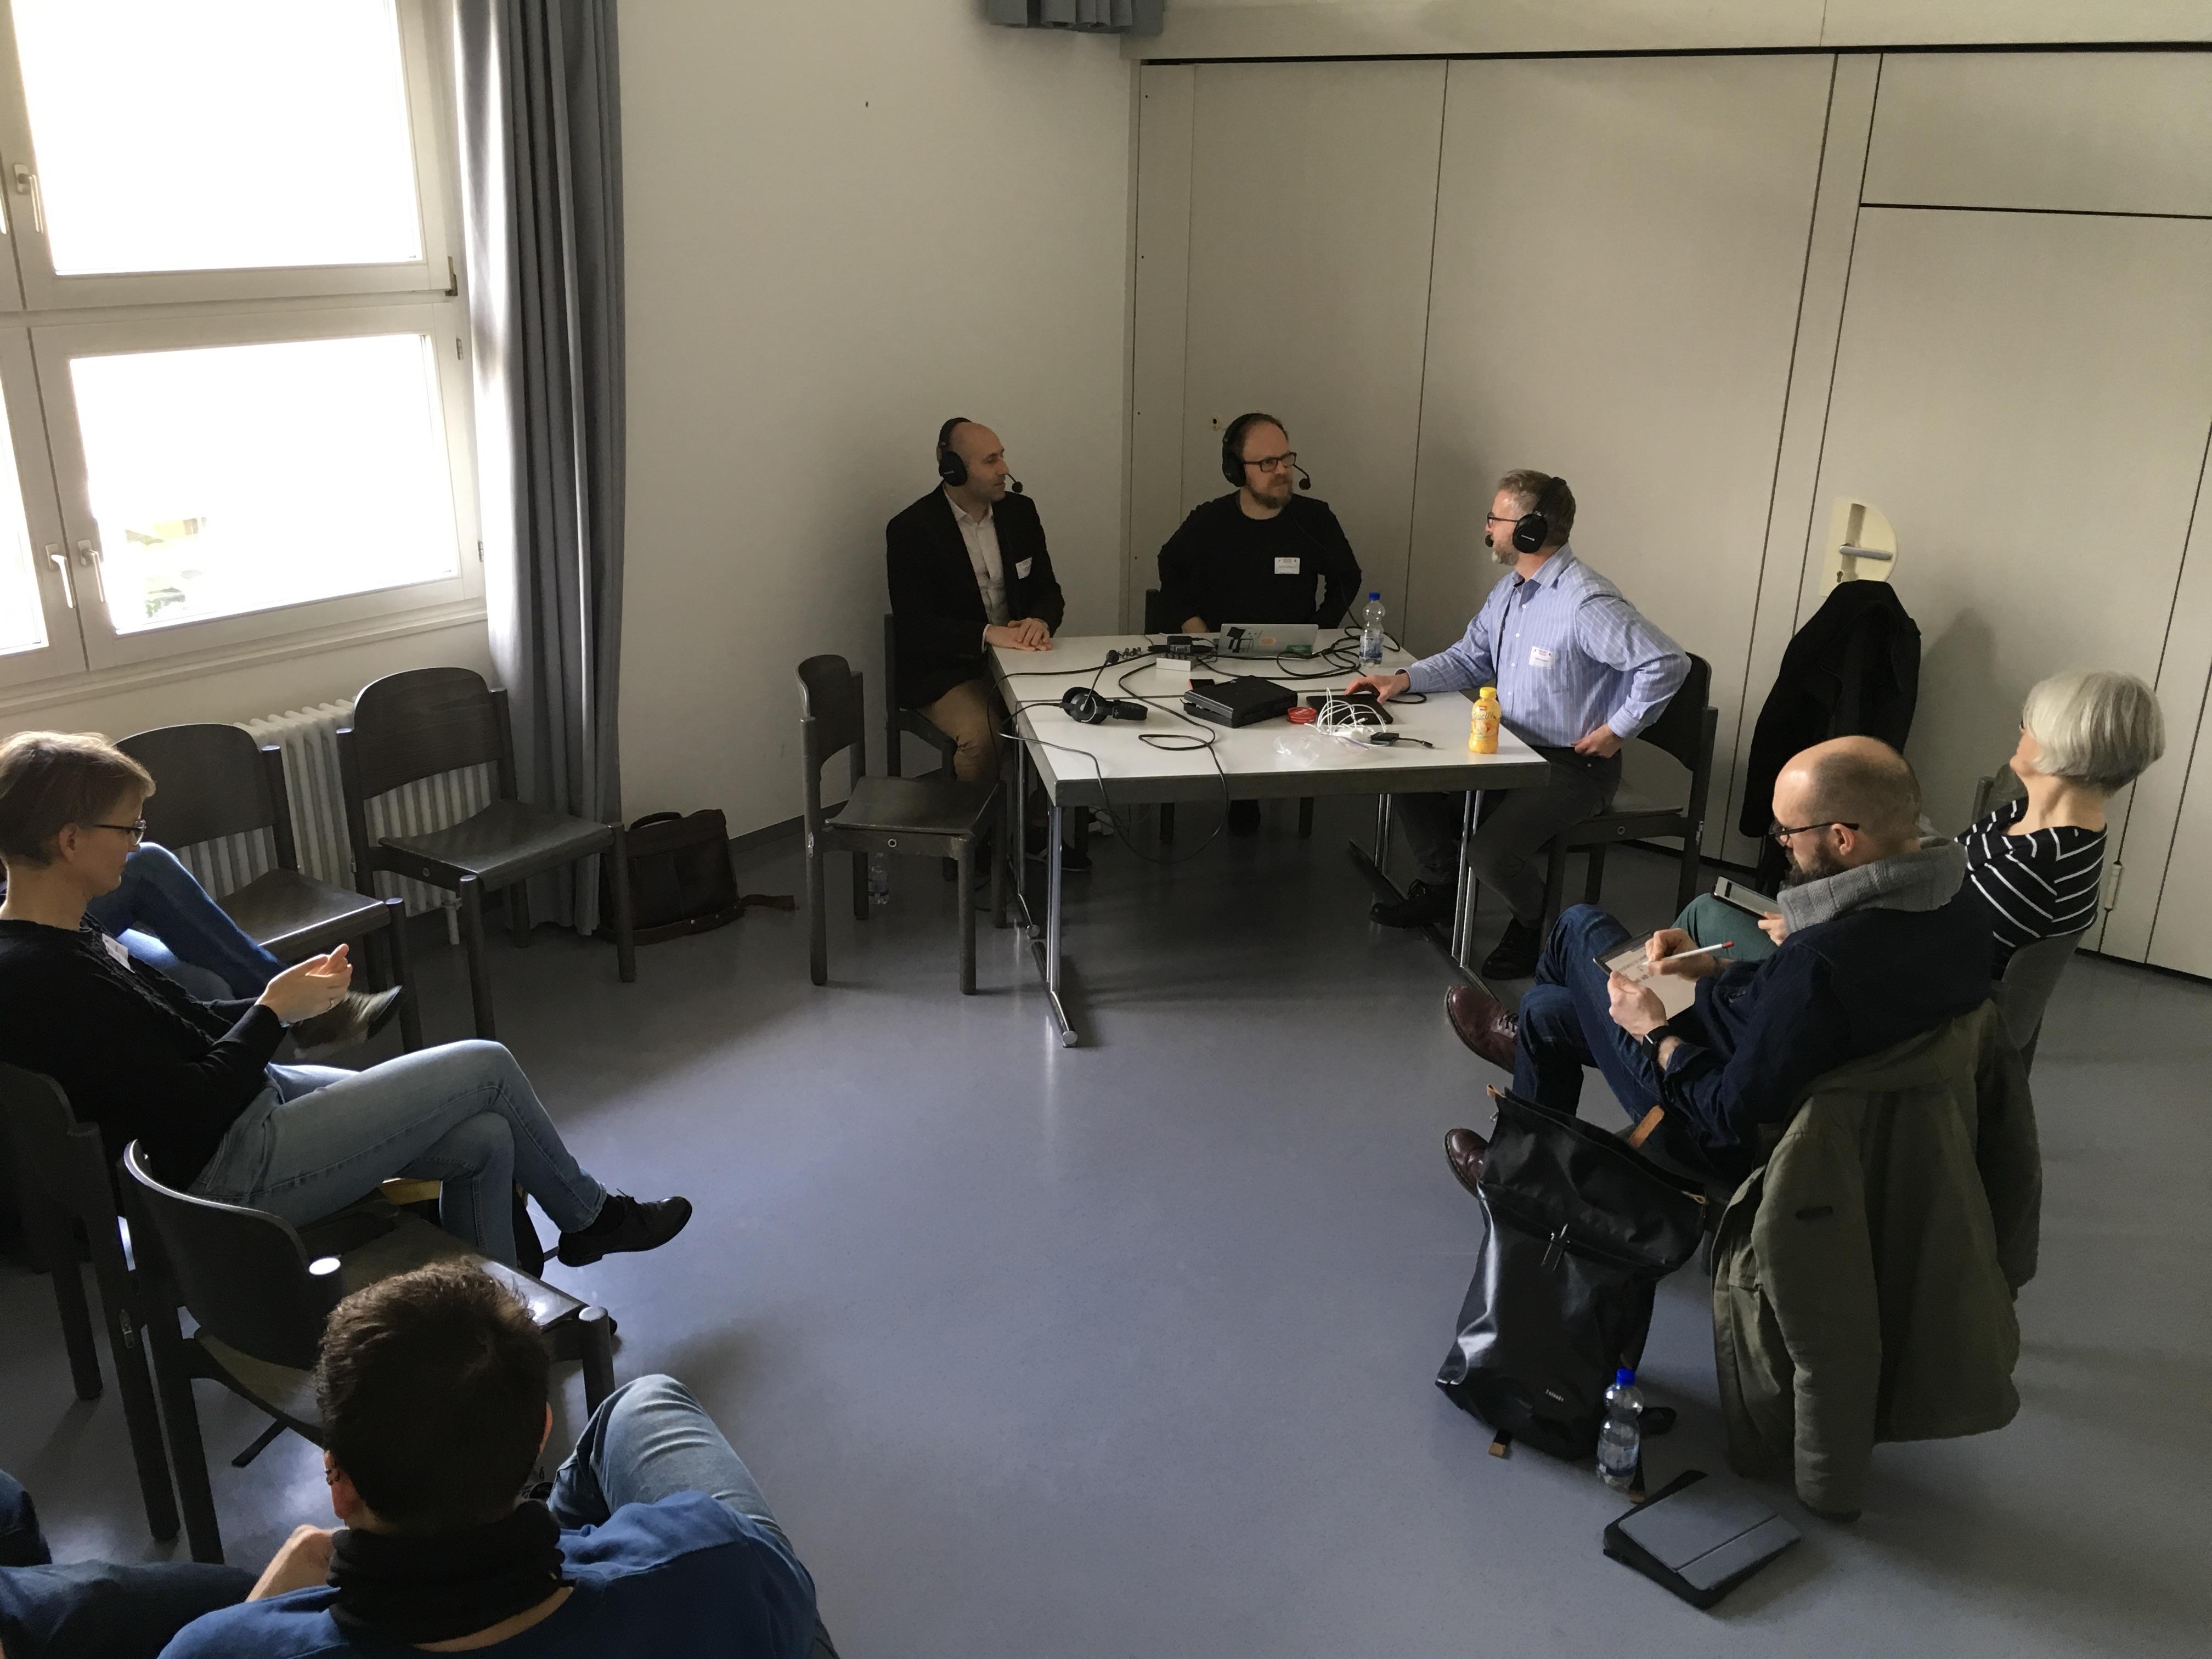 Dejan Mihajlović, Jöran Muuß-Merholz und Axel Krommer während des Podcasts vor Publikum, Foto von Birgit Kury (CC BY 4.0)